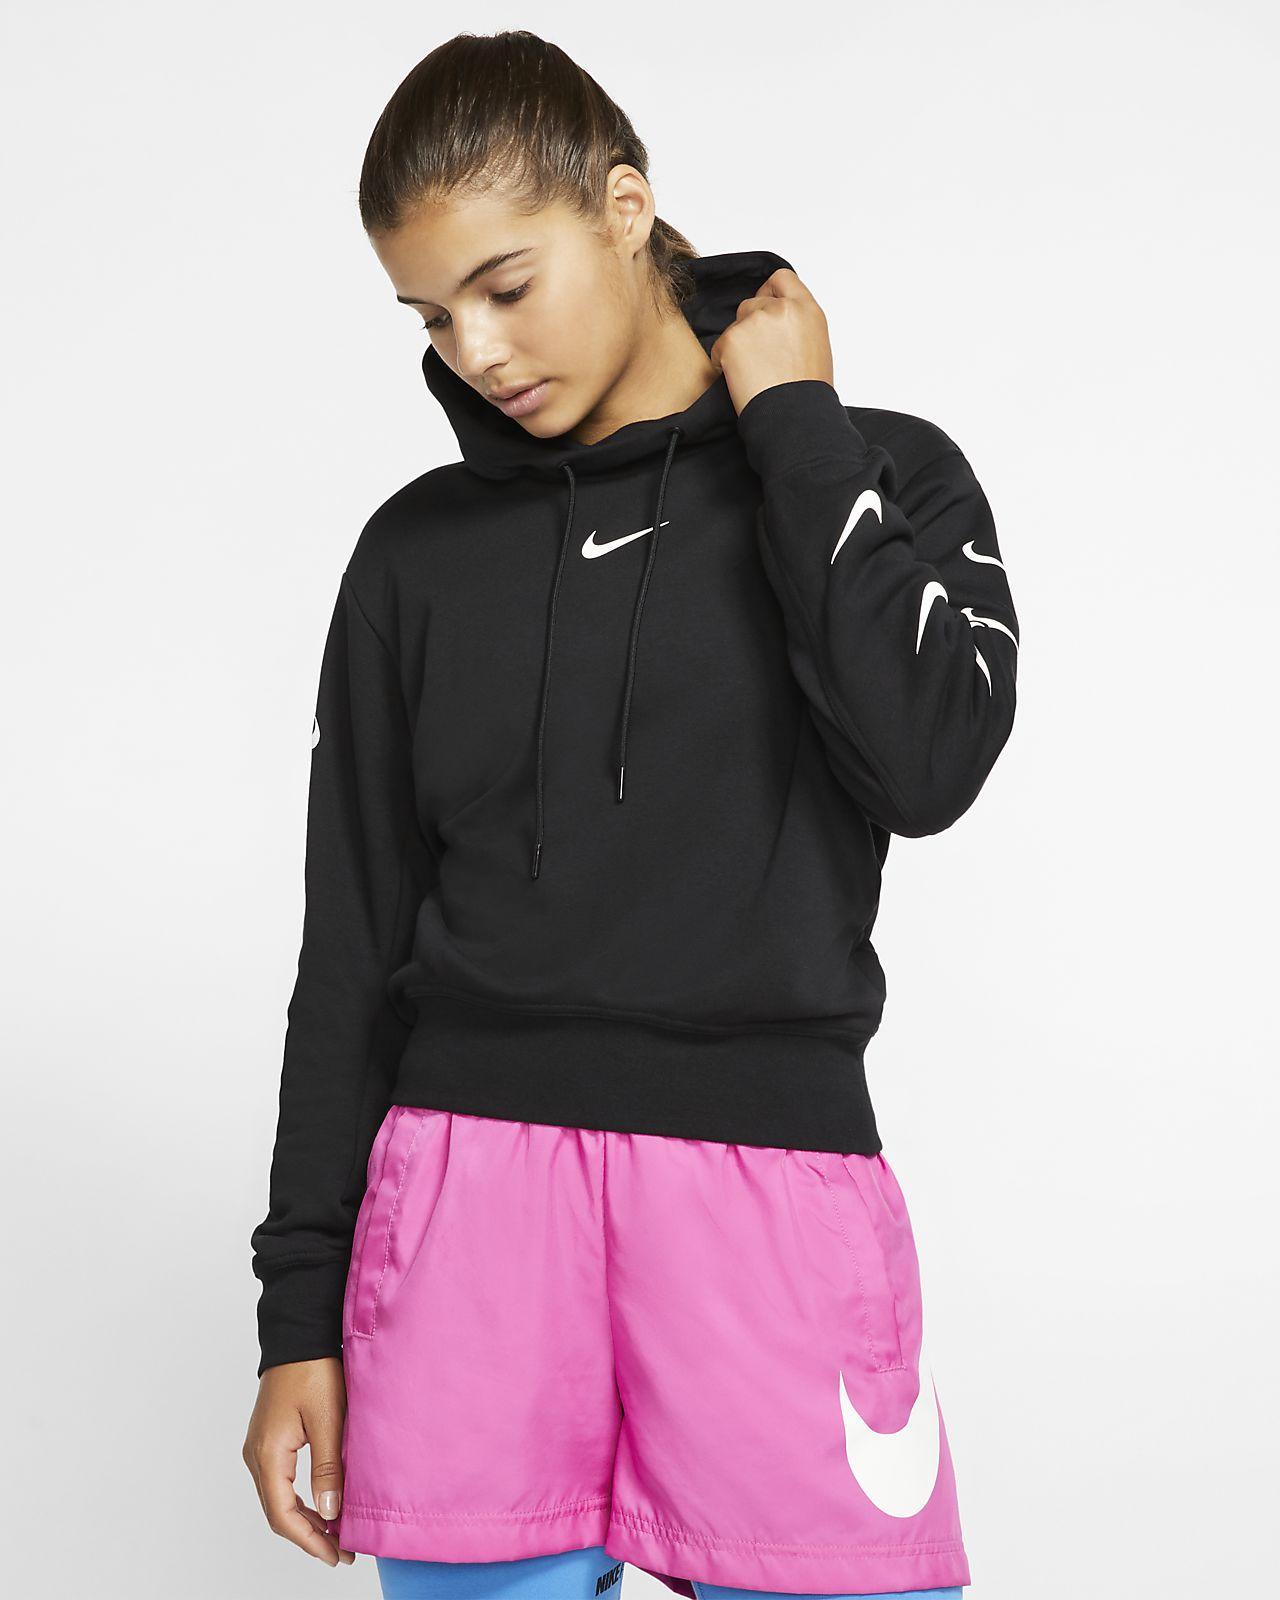 new style daf95 379fc Nike Sportswear Swoosh Damen-Hoodie